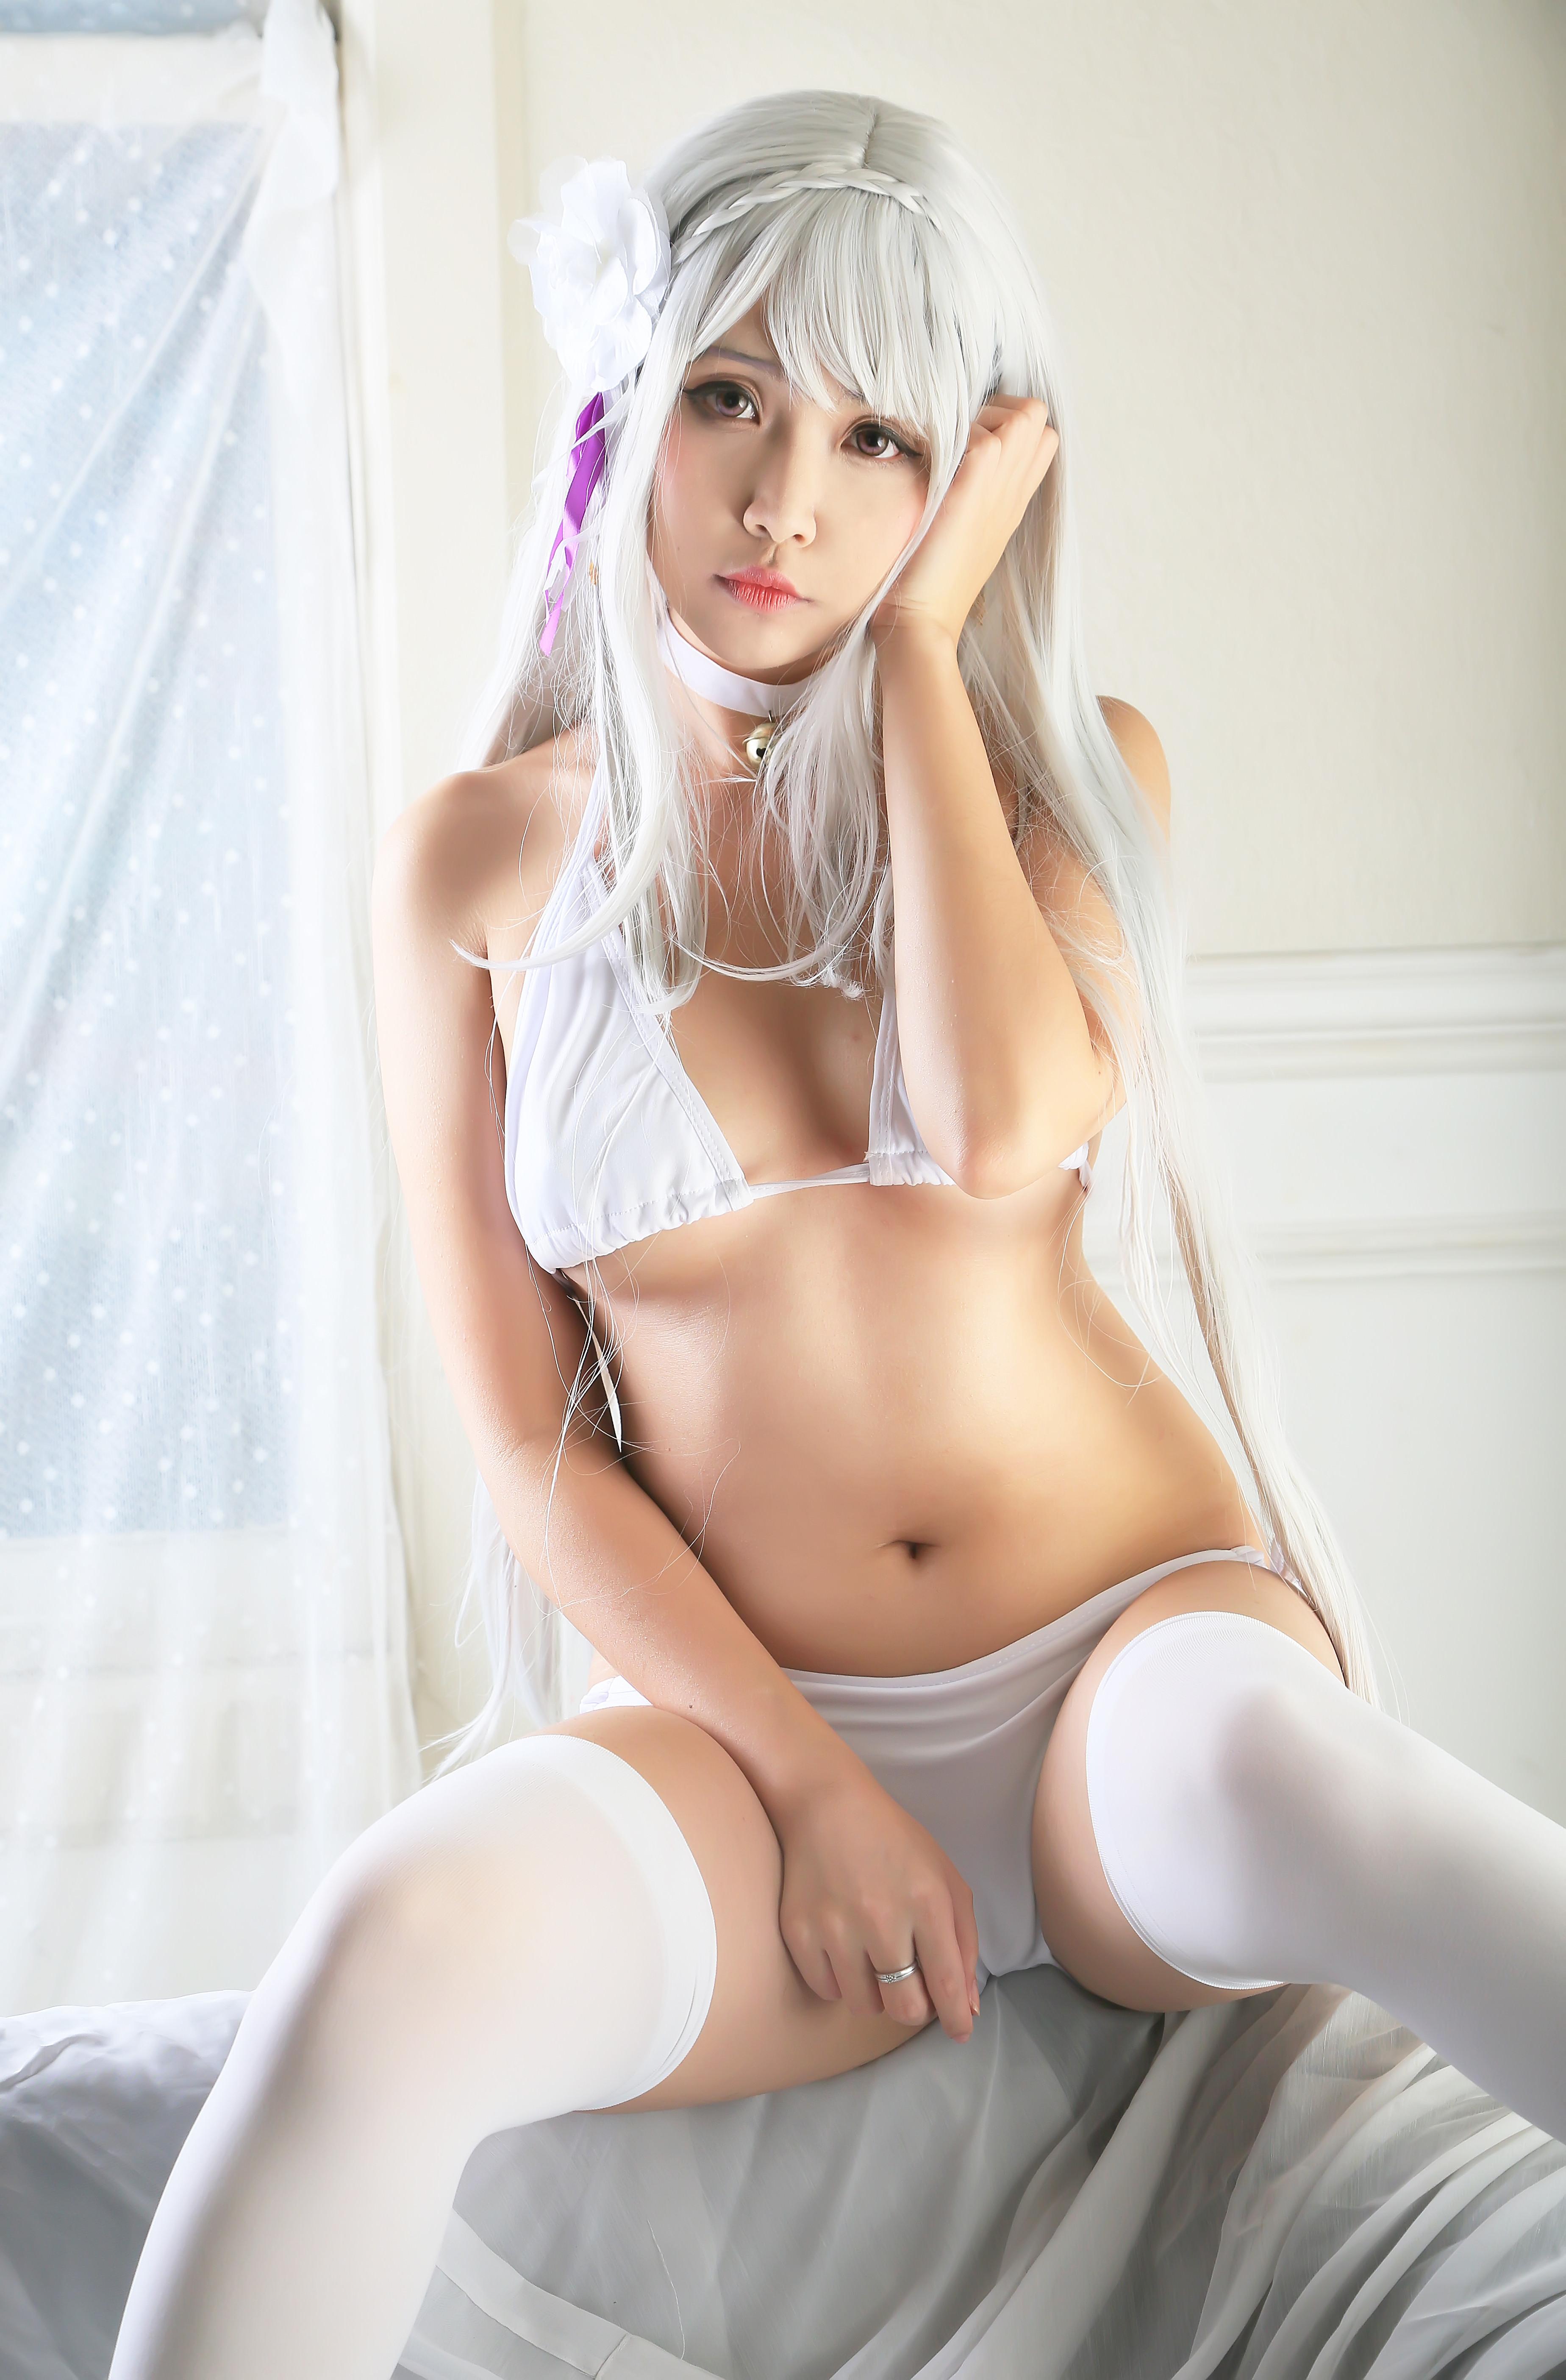 Hana Bunny Nude & Sex Tape Cosplay Leaked! 0051